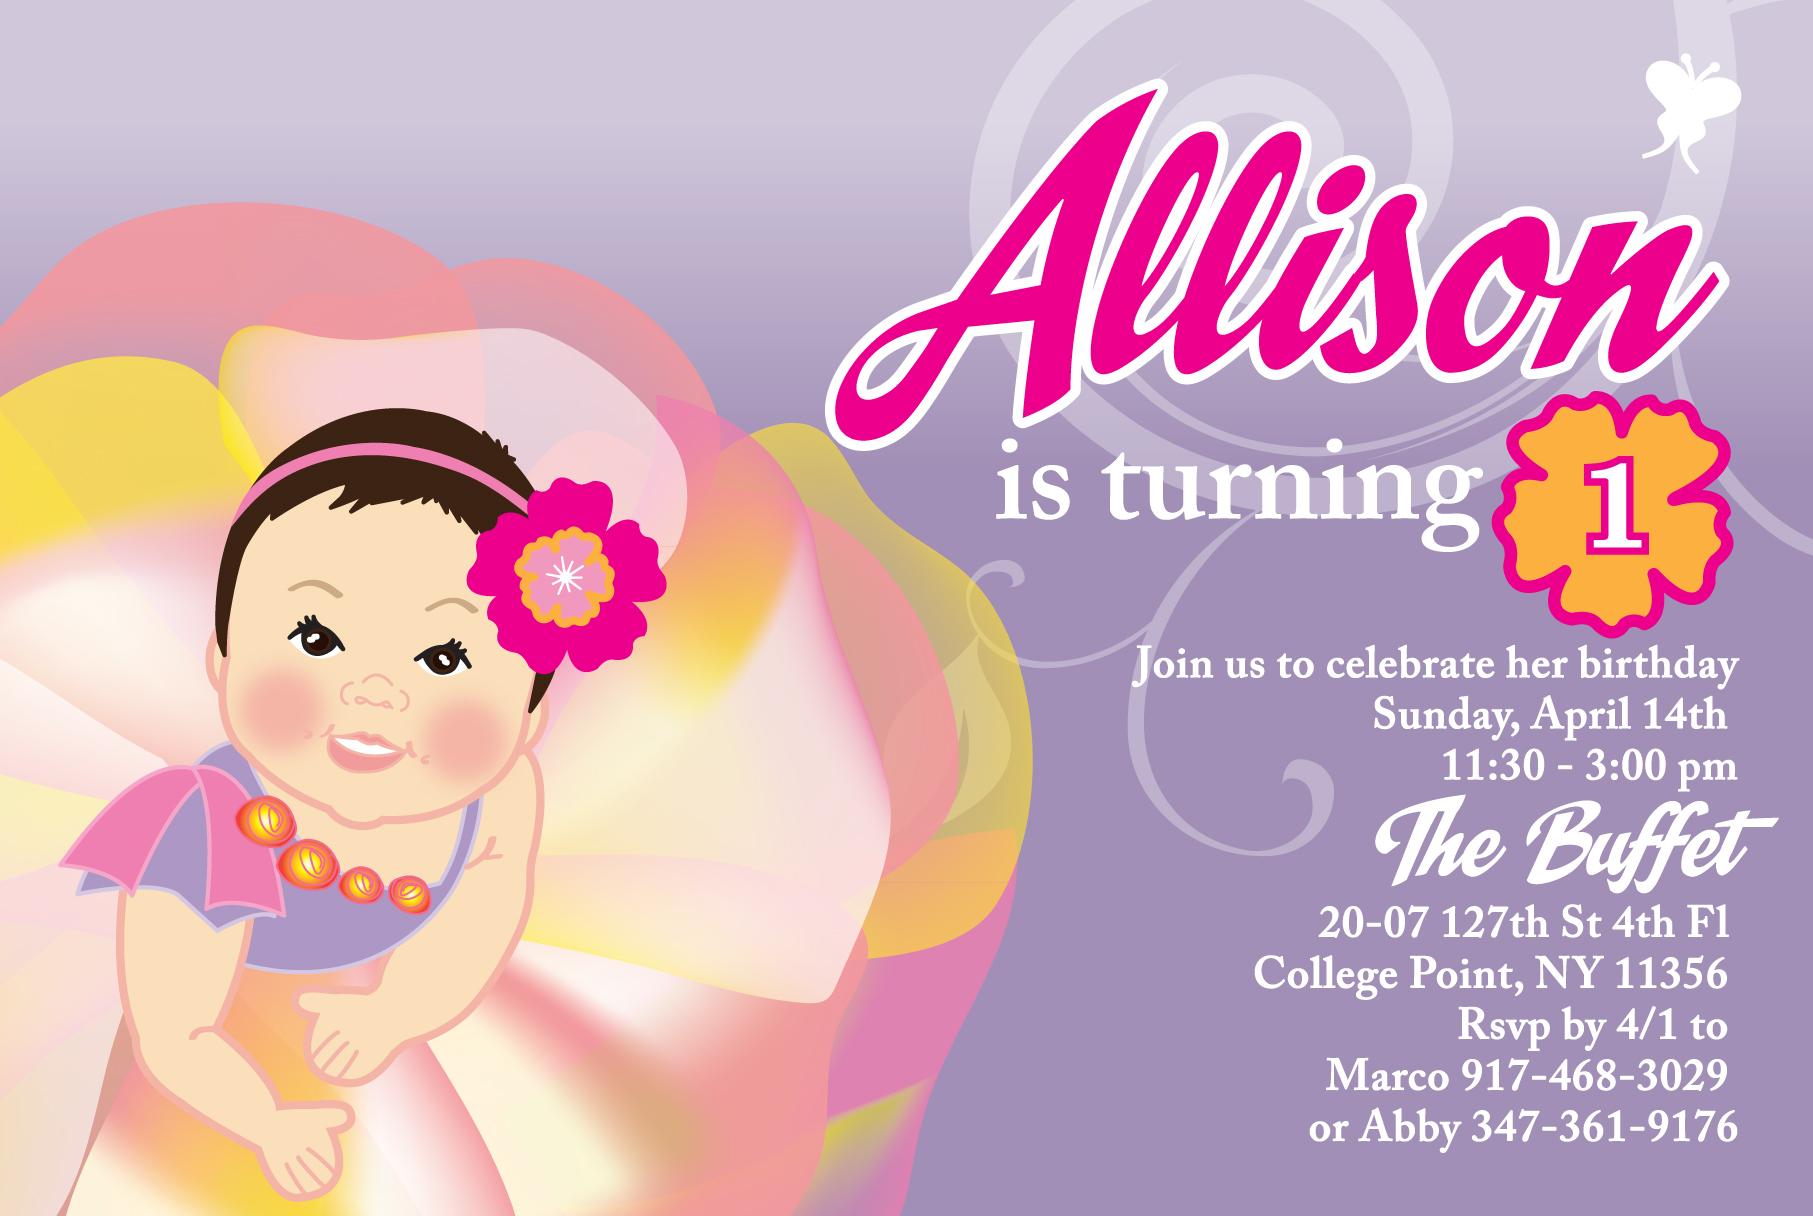 04_Allison_invitation_Final.jpg